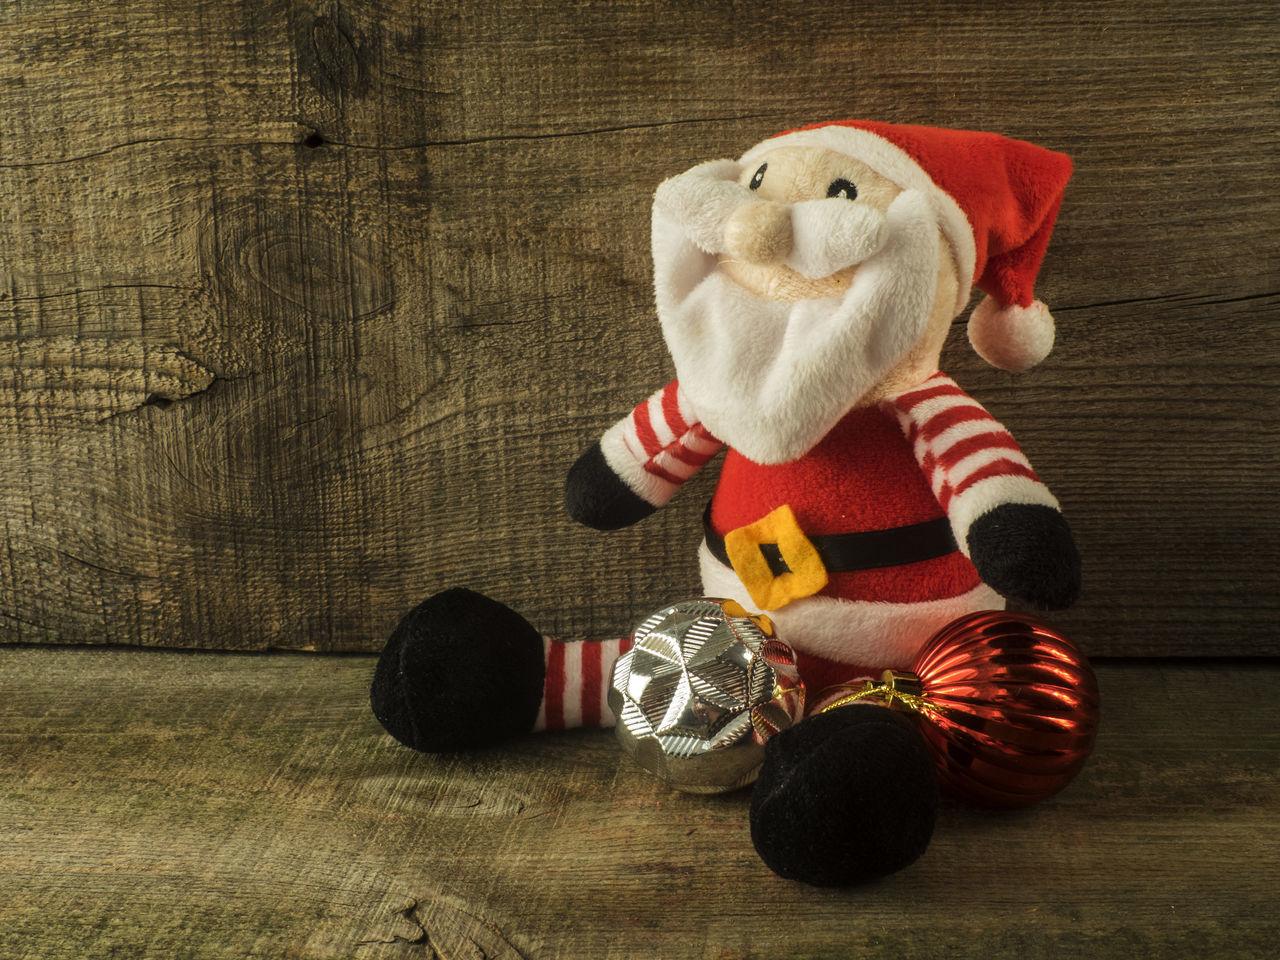 Beautiful stock photos of weihnachtsmann, stuffed toy, teddy bear, indoors, christmas